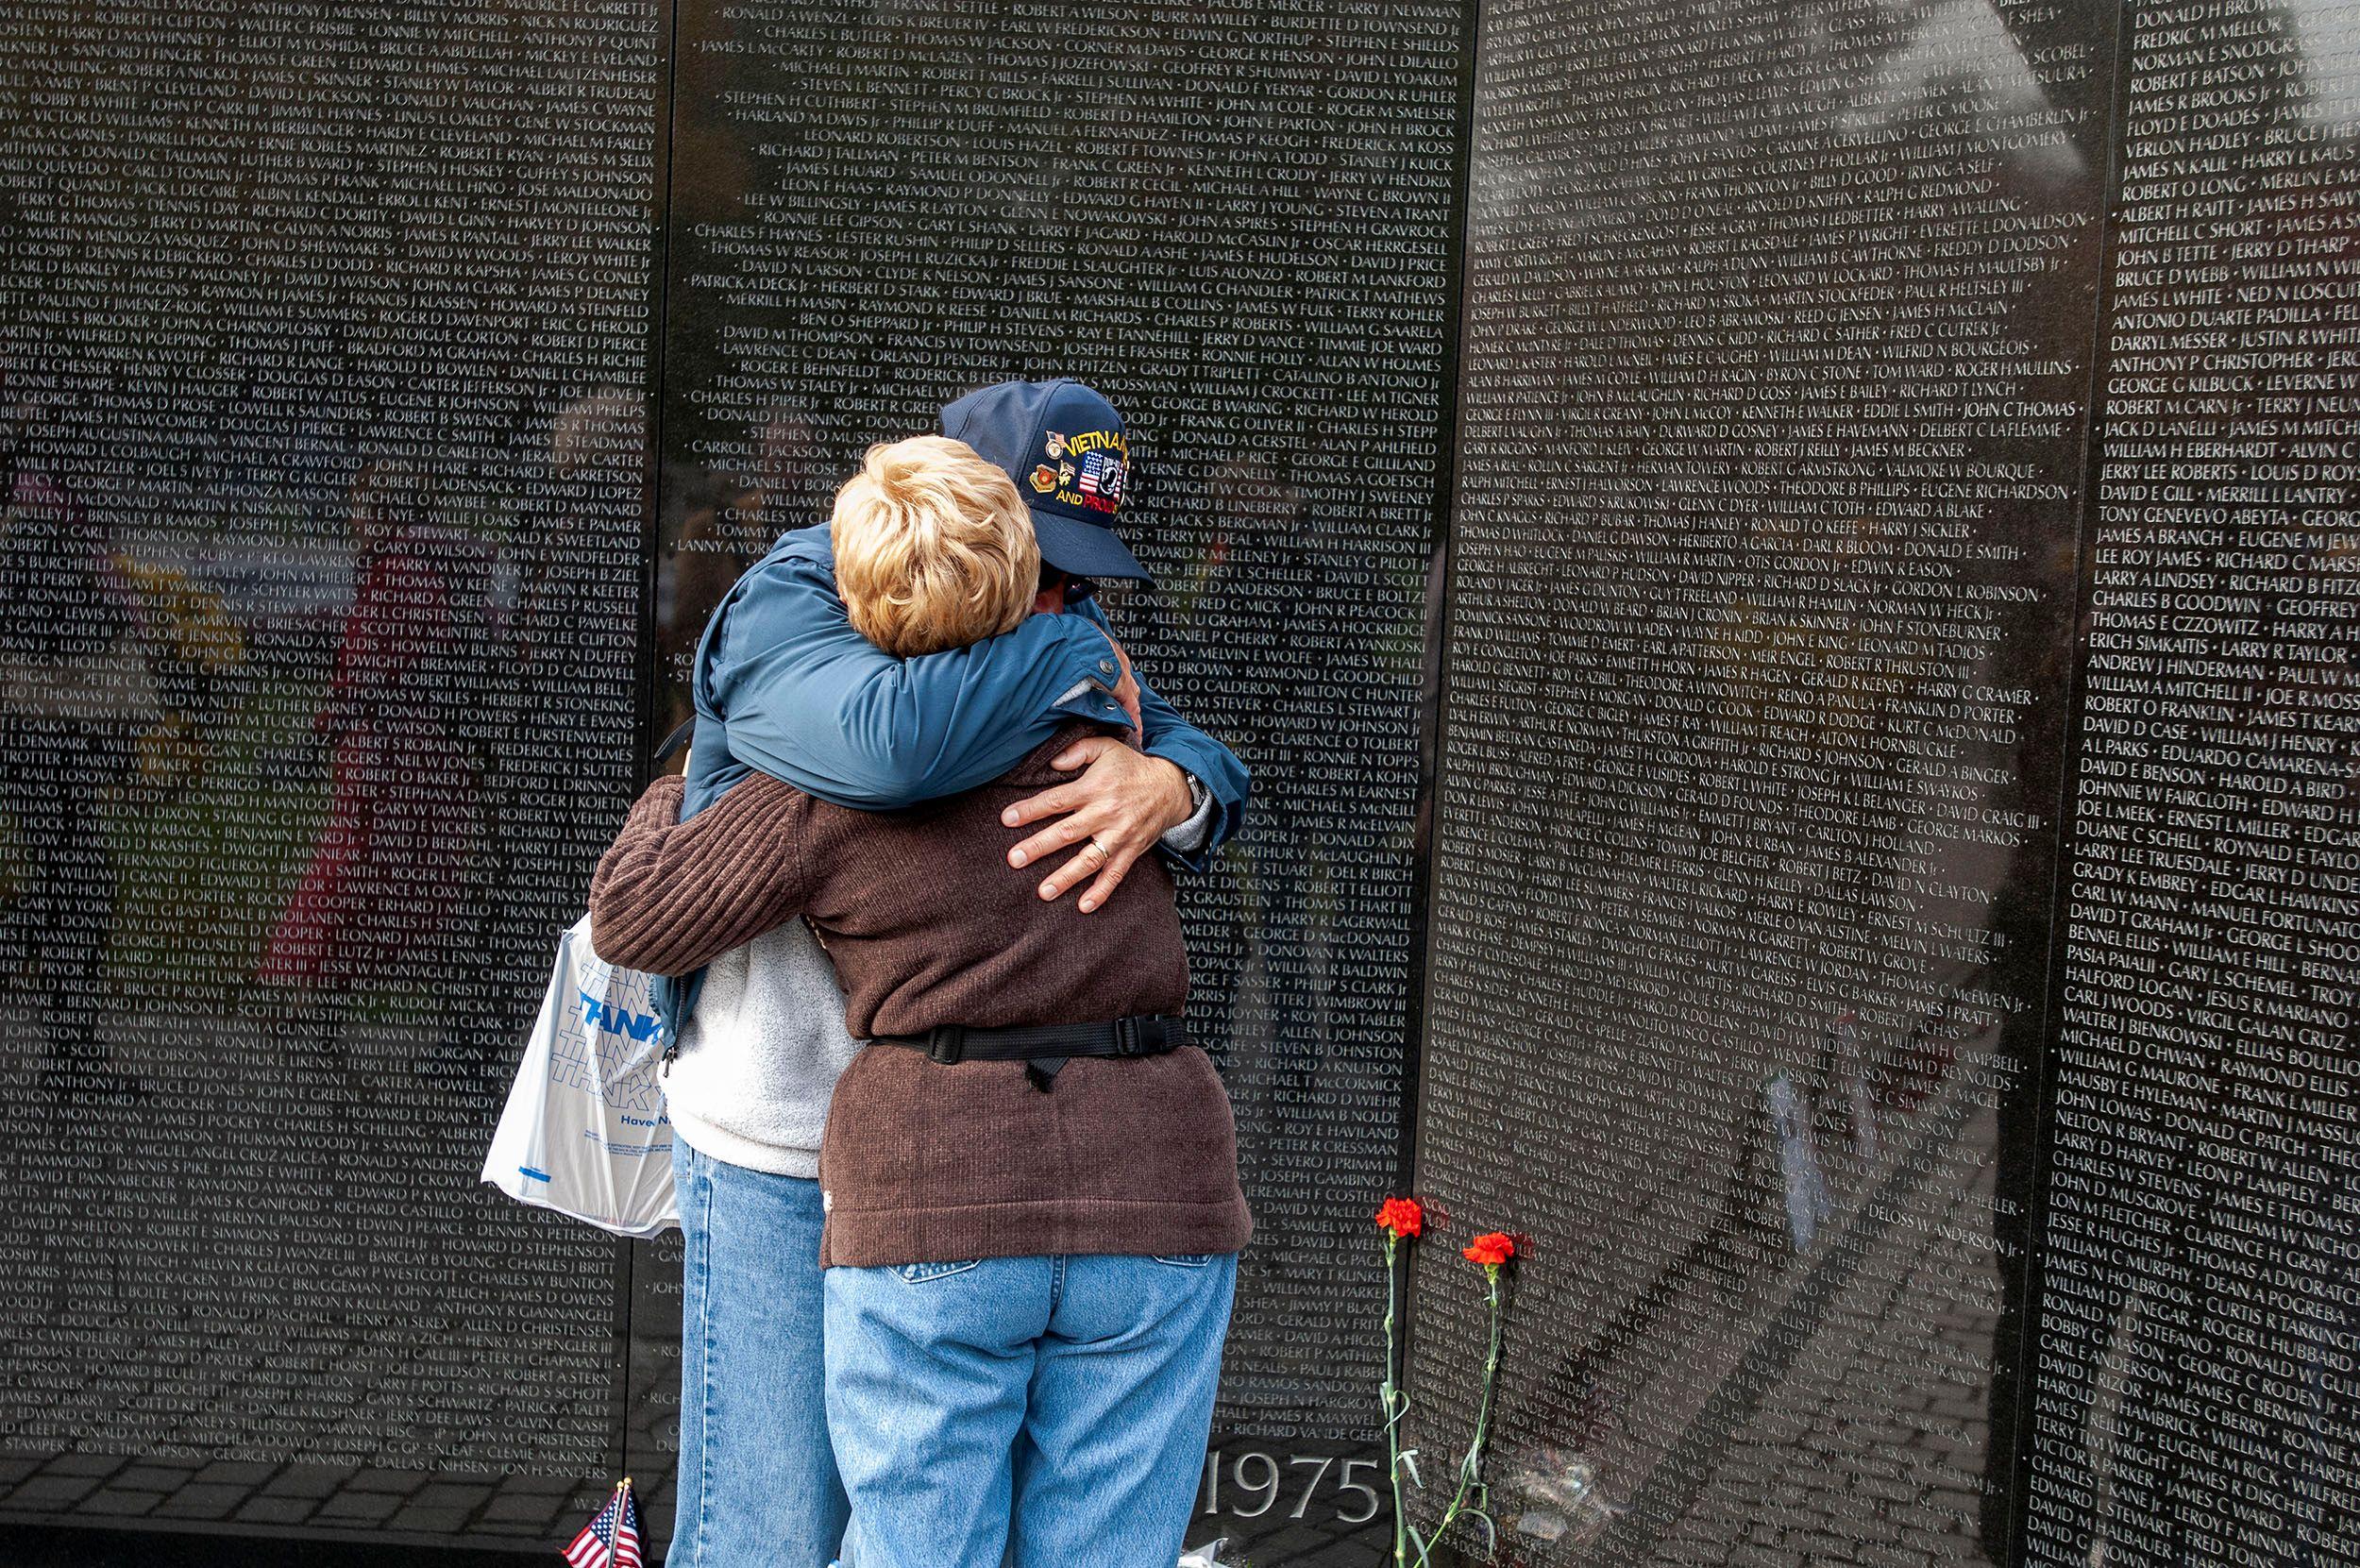 Vietnam Memorial. Washington, D.C.